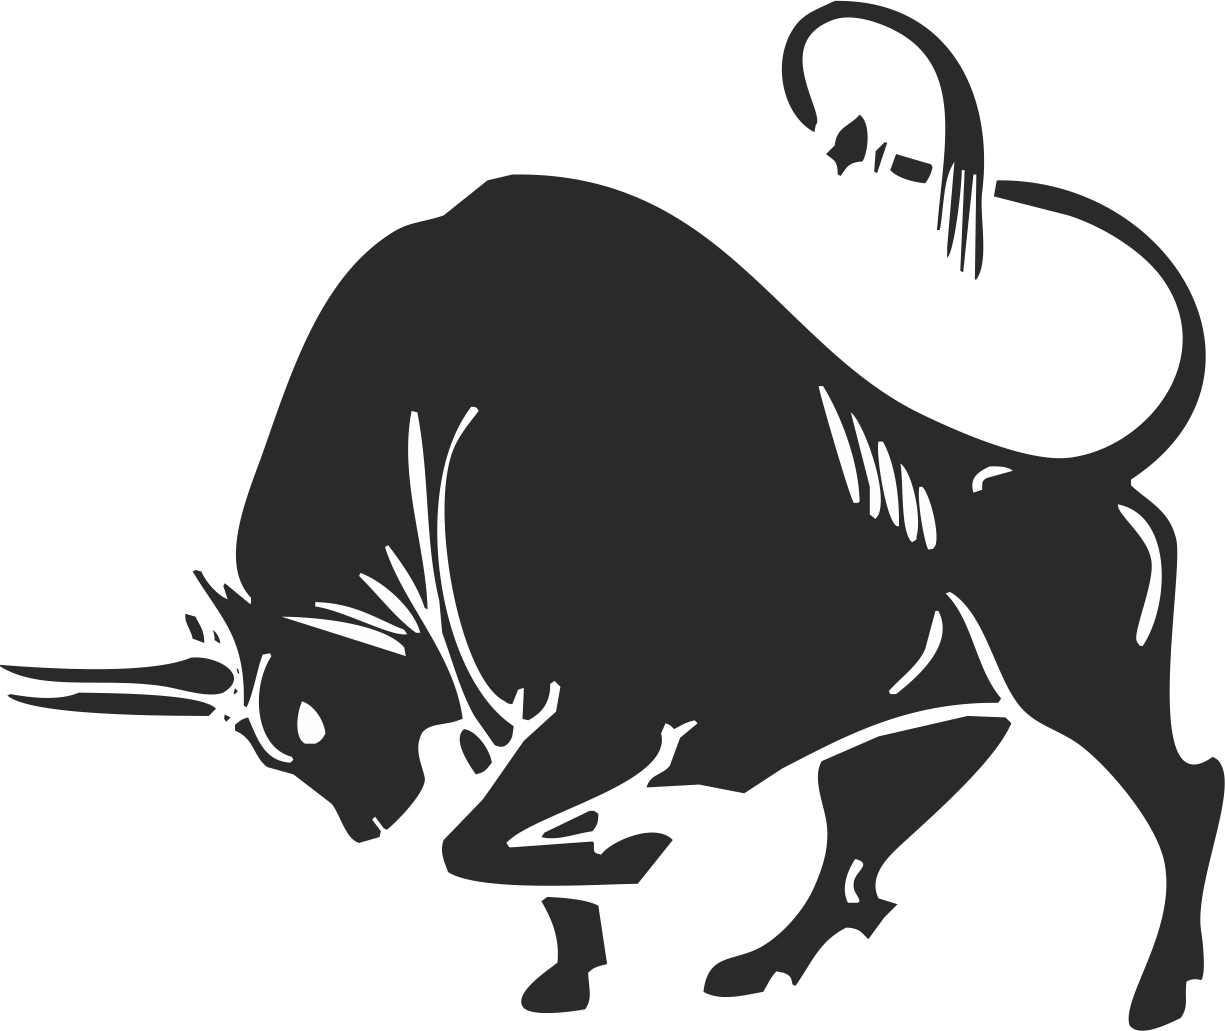 Bull silhouette Free CDR Vectors Art